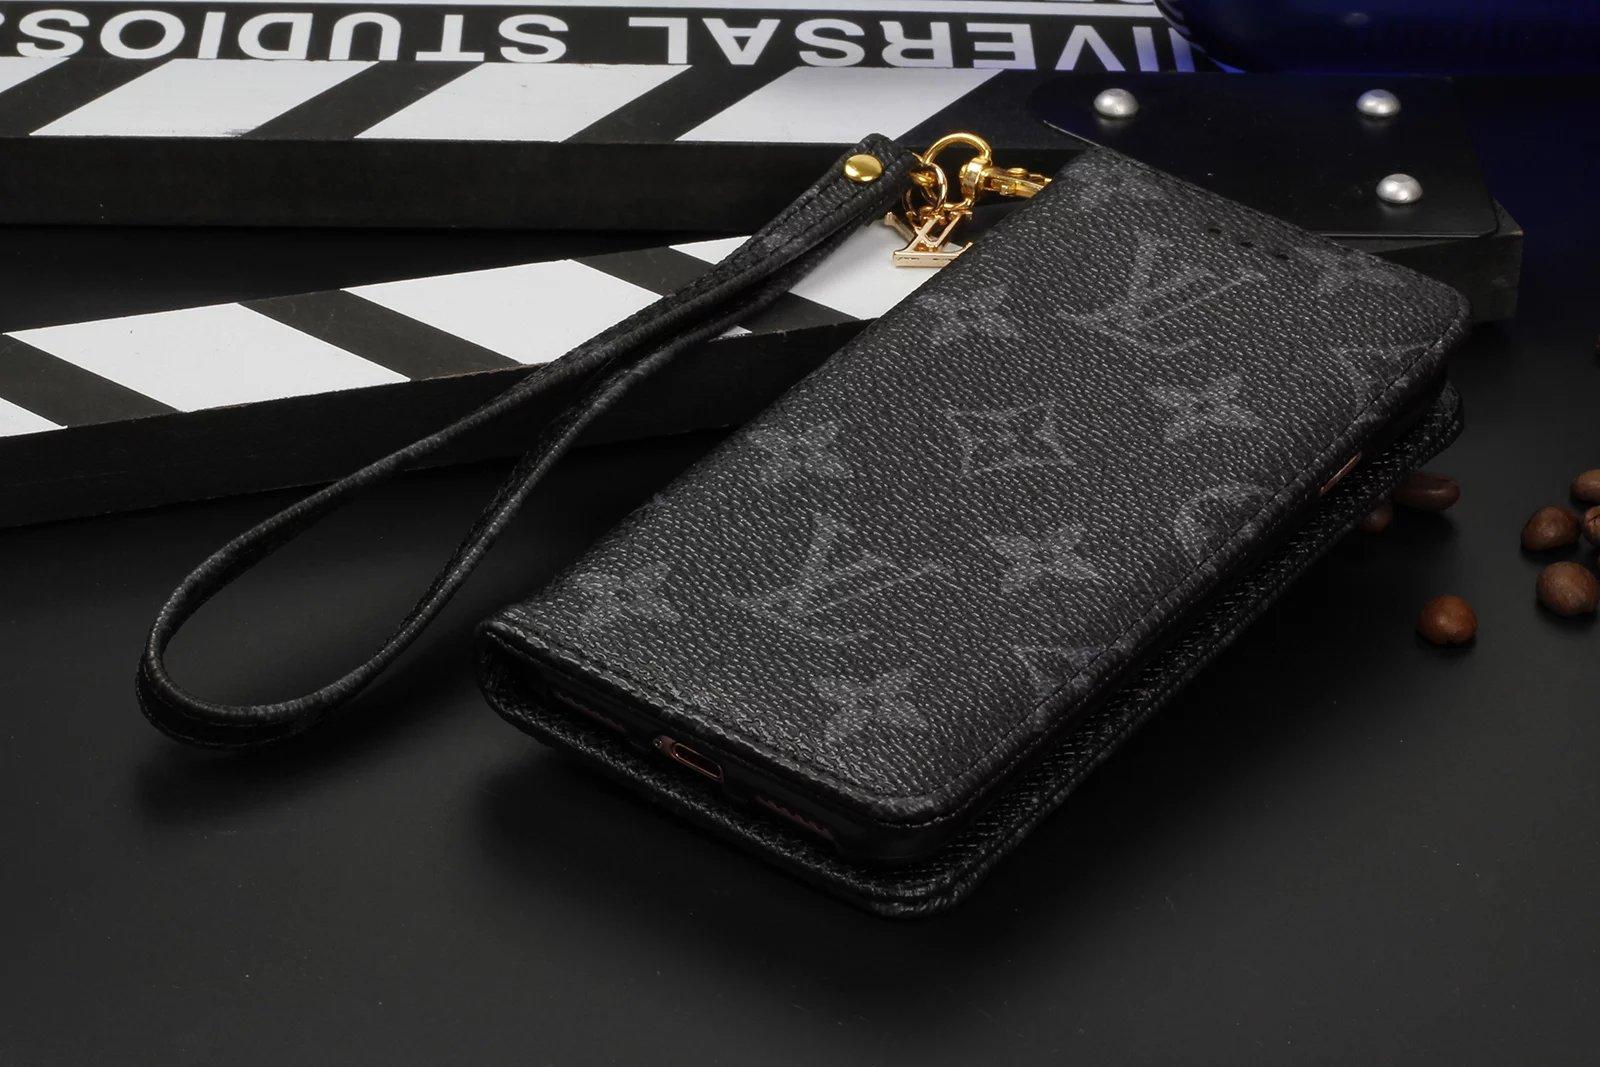 handy hülle iphone iphone case selbst gestalten Louis Vuitton iphone6s hülle iphone hülle geldbör6s iphone 6s zu 6s smartphone ca6s bedrucken lustige iphone 6s hüllen handyhüllen designer apple iphone 6 preisvergleich